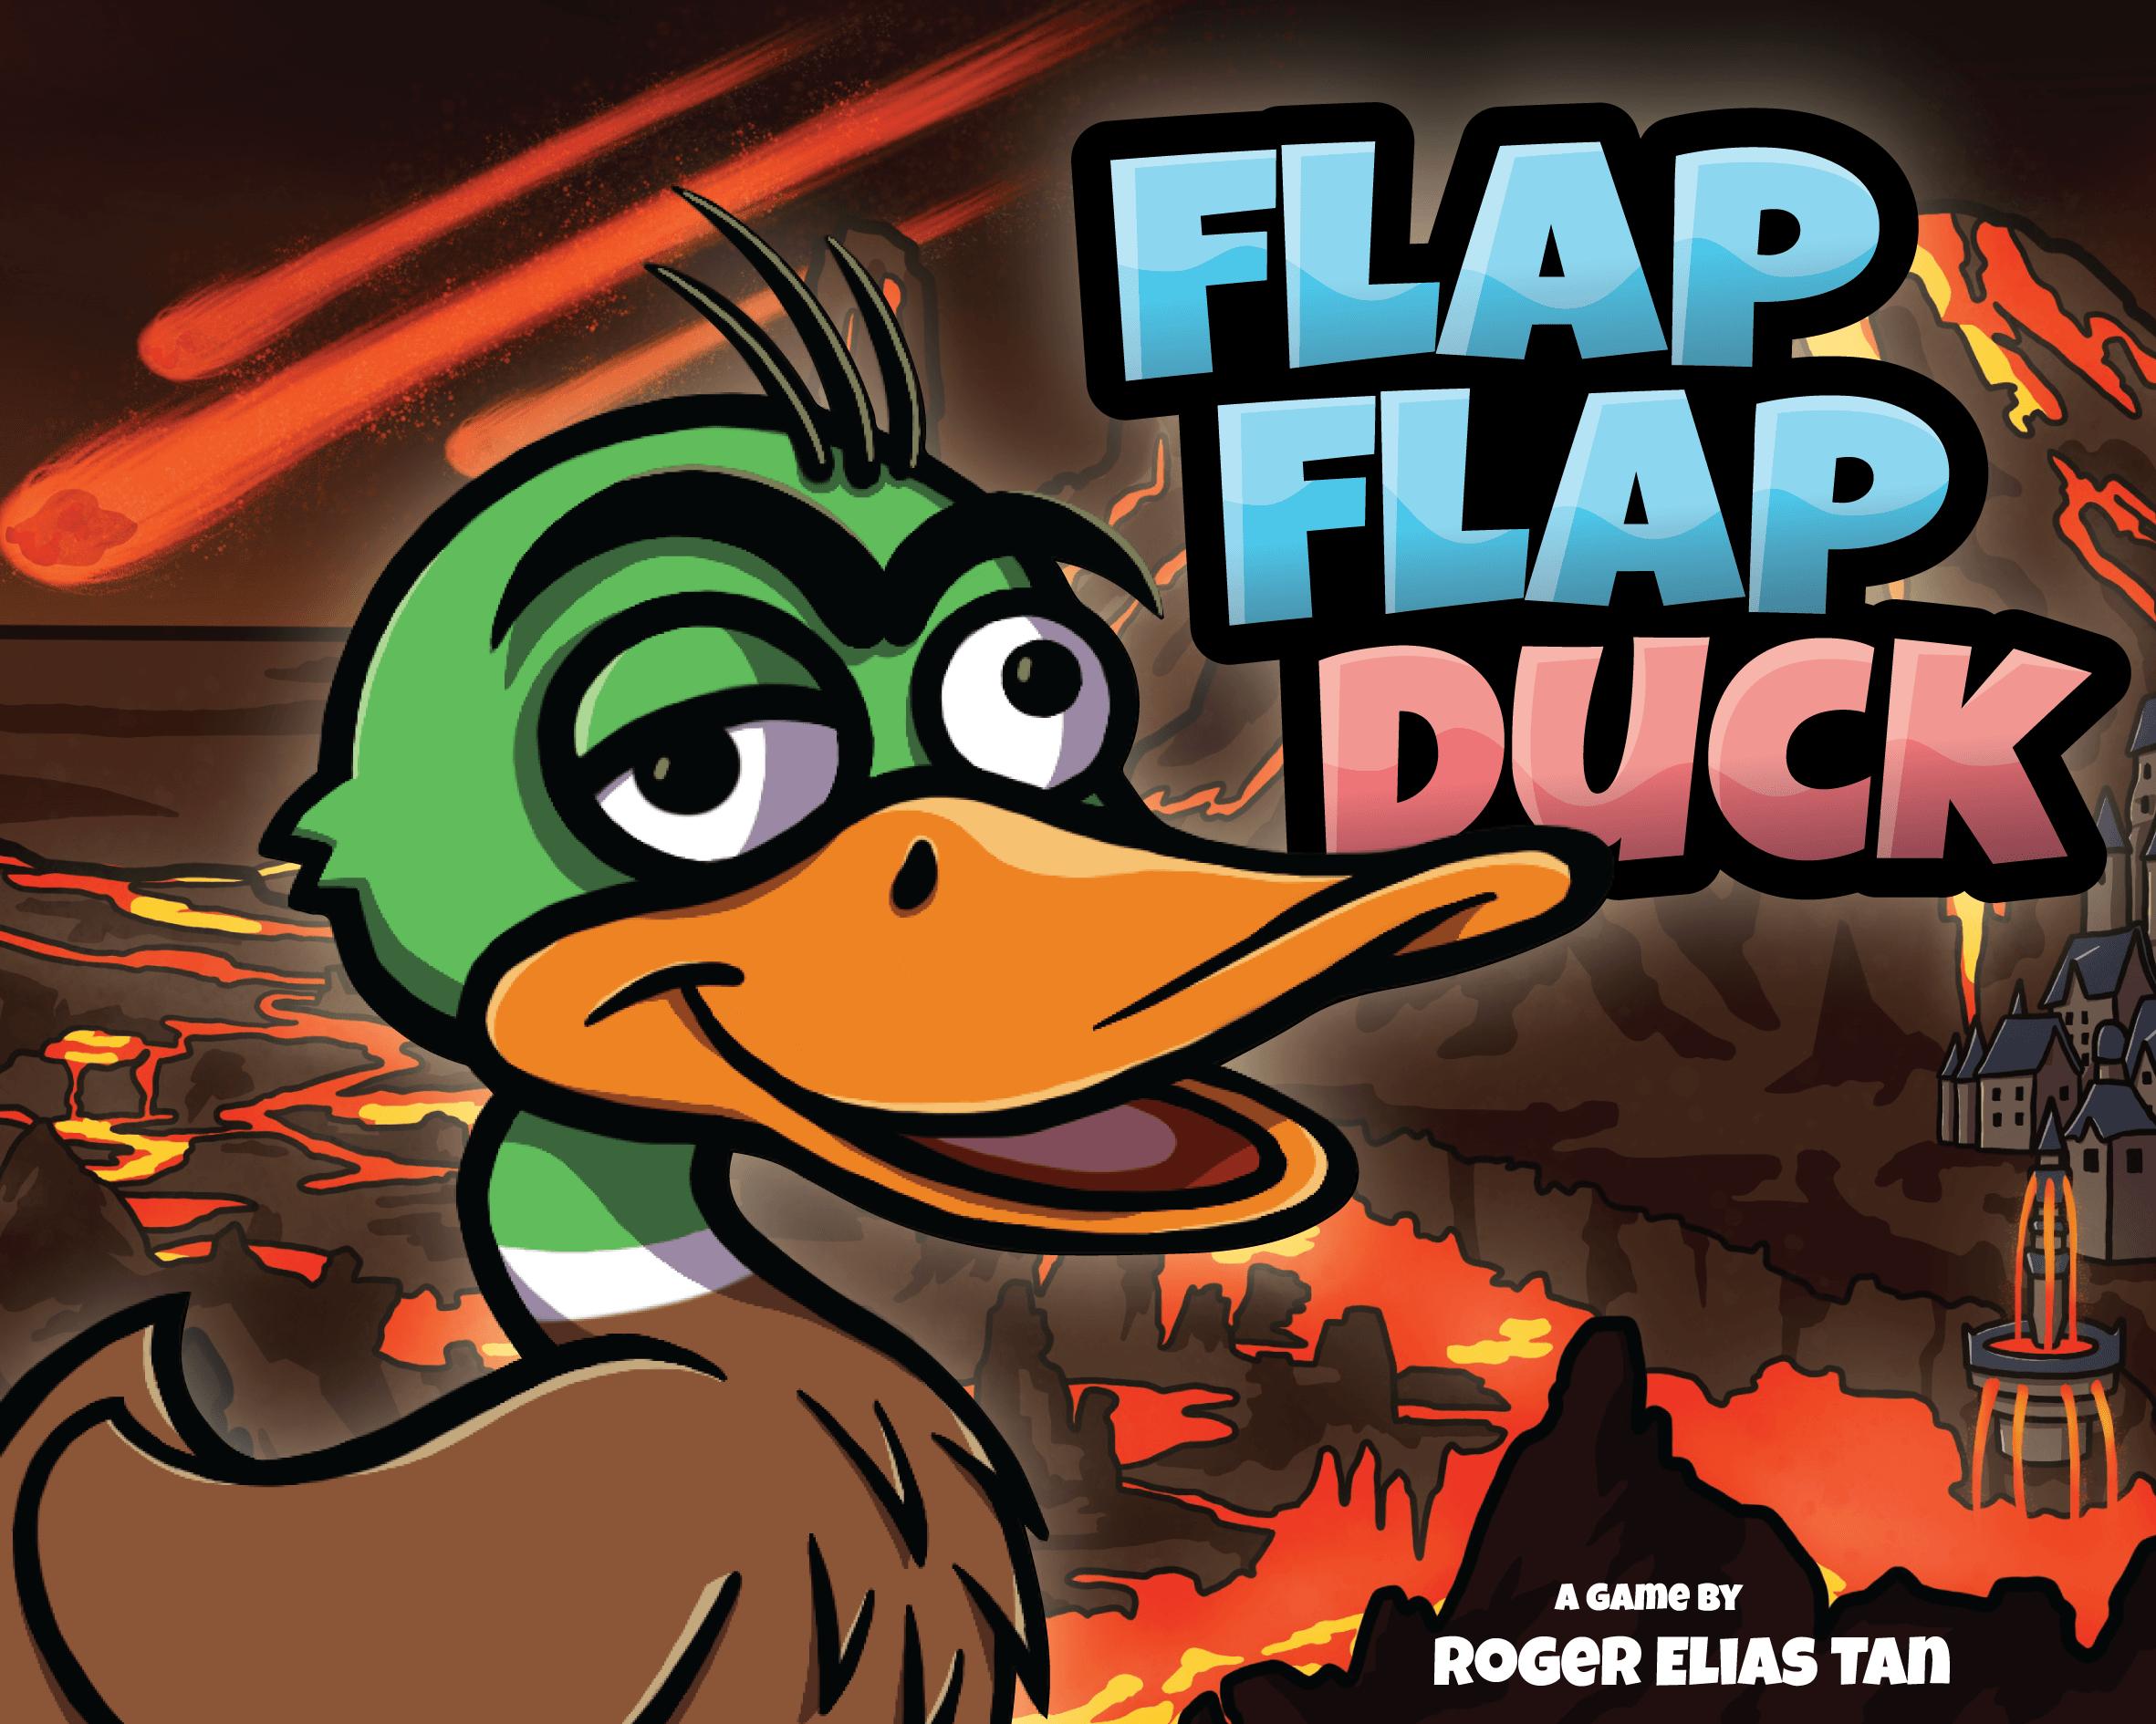 Flap Flap Duck